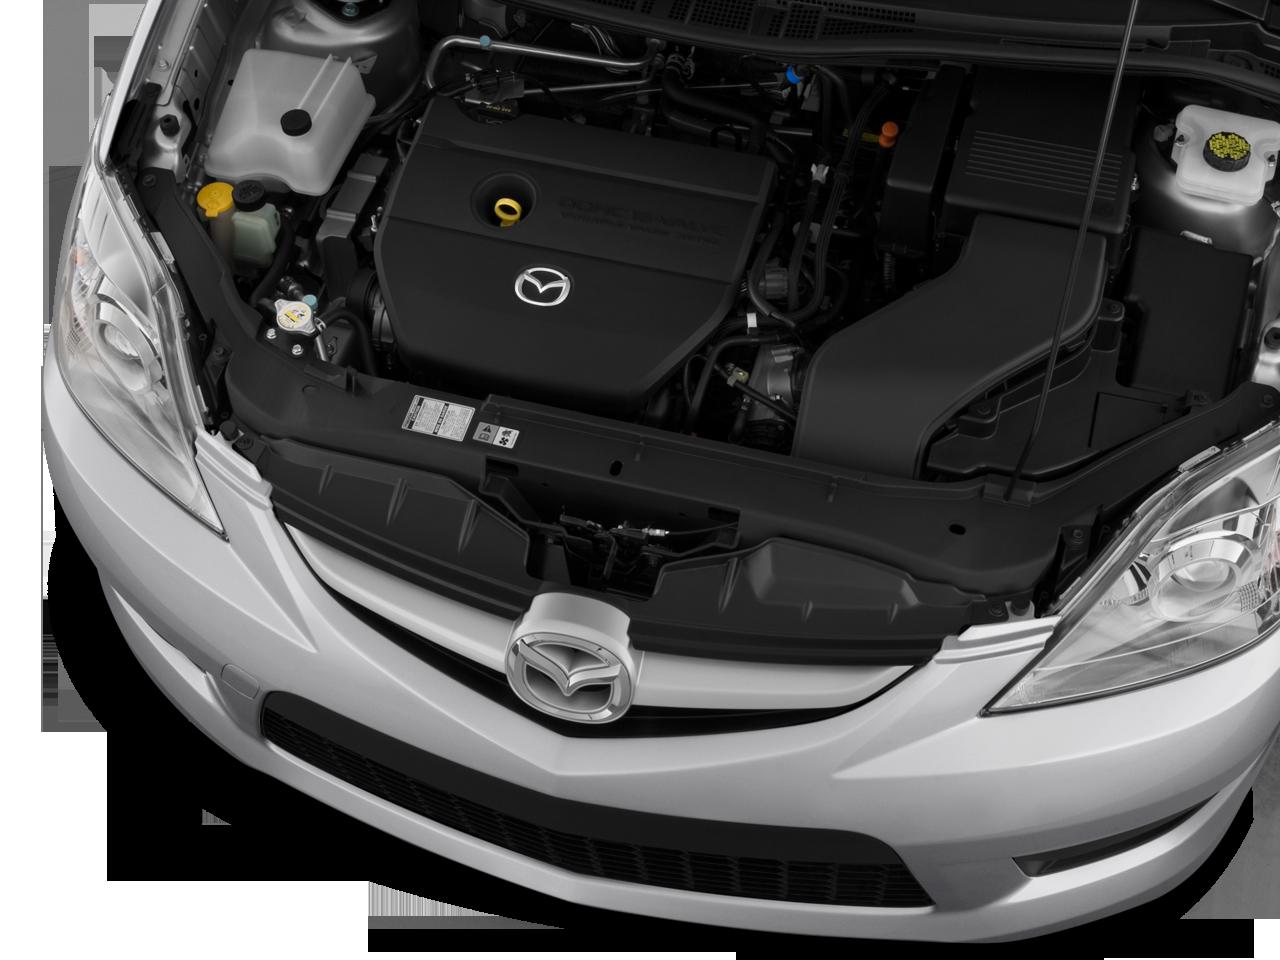 2010 Mazda5 Touring Mazda Minivan Review Automobile